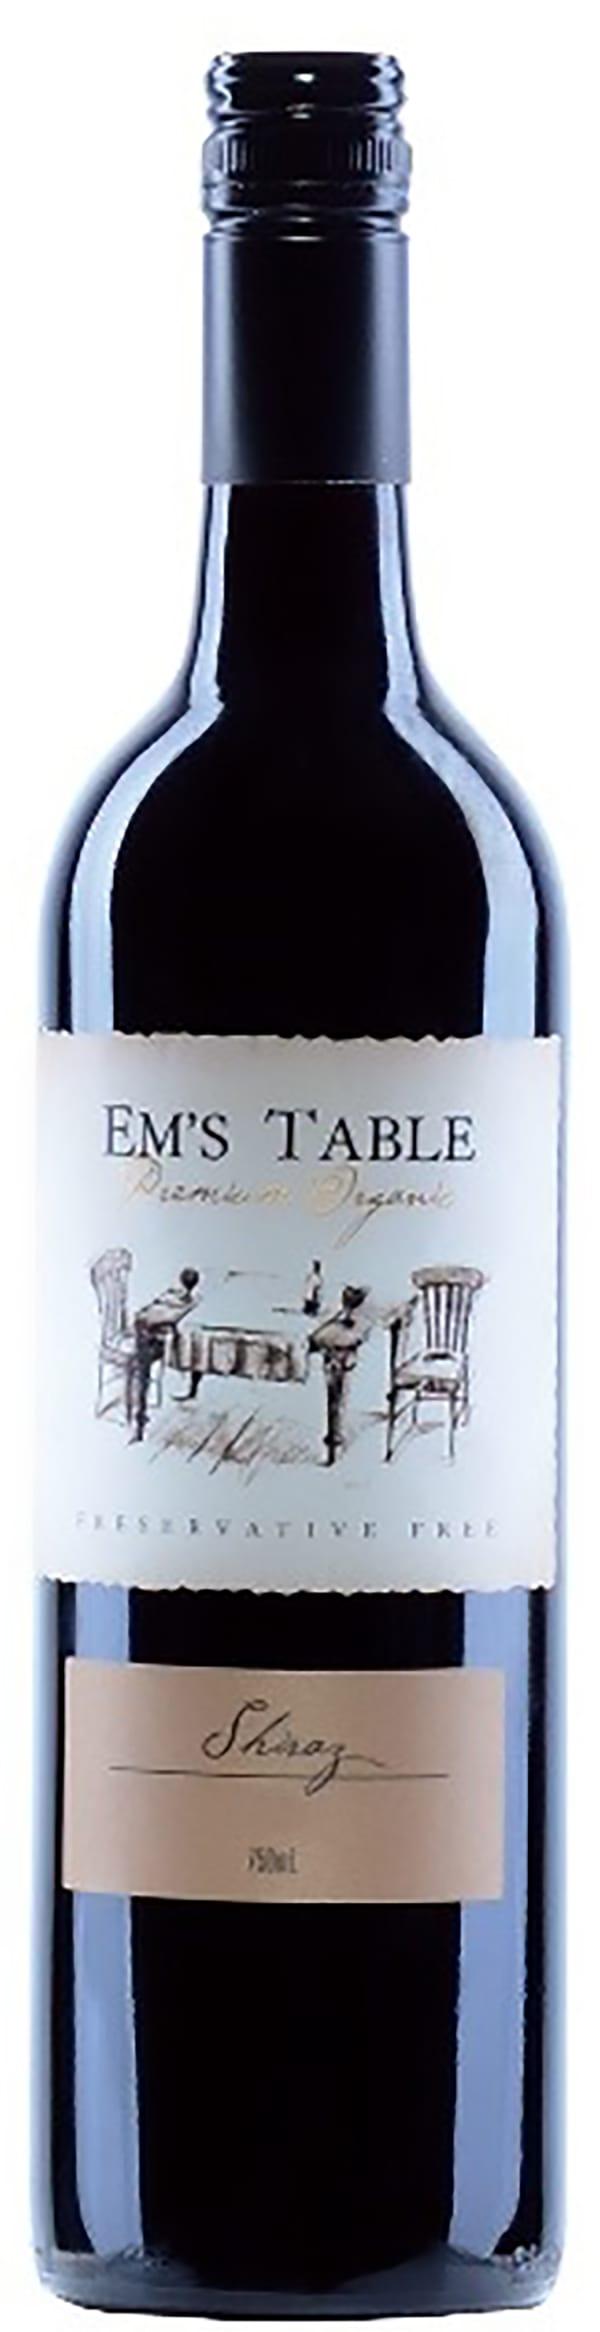 Em's Table Shiraz 2013